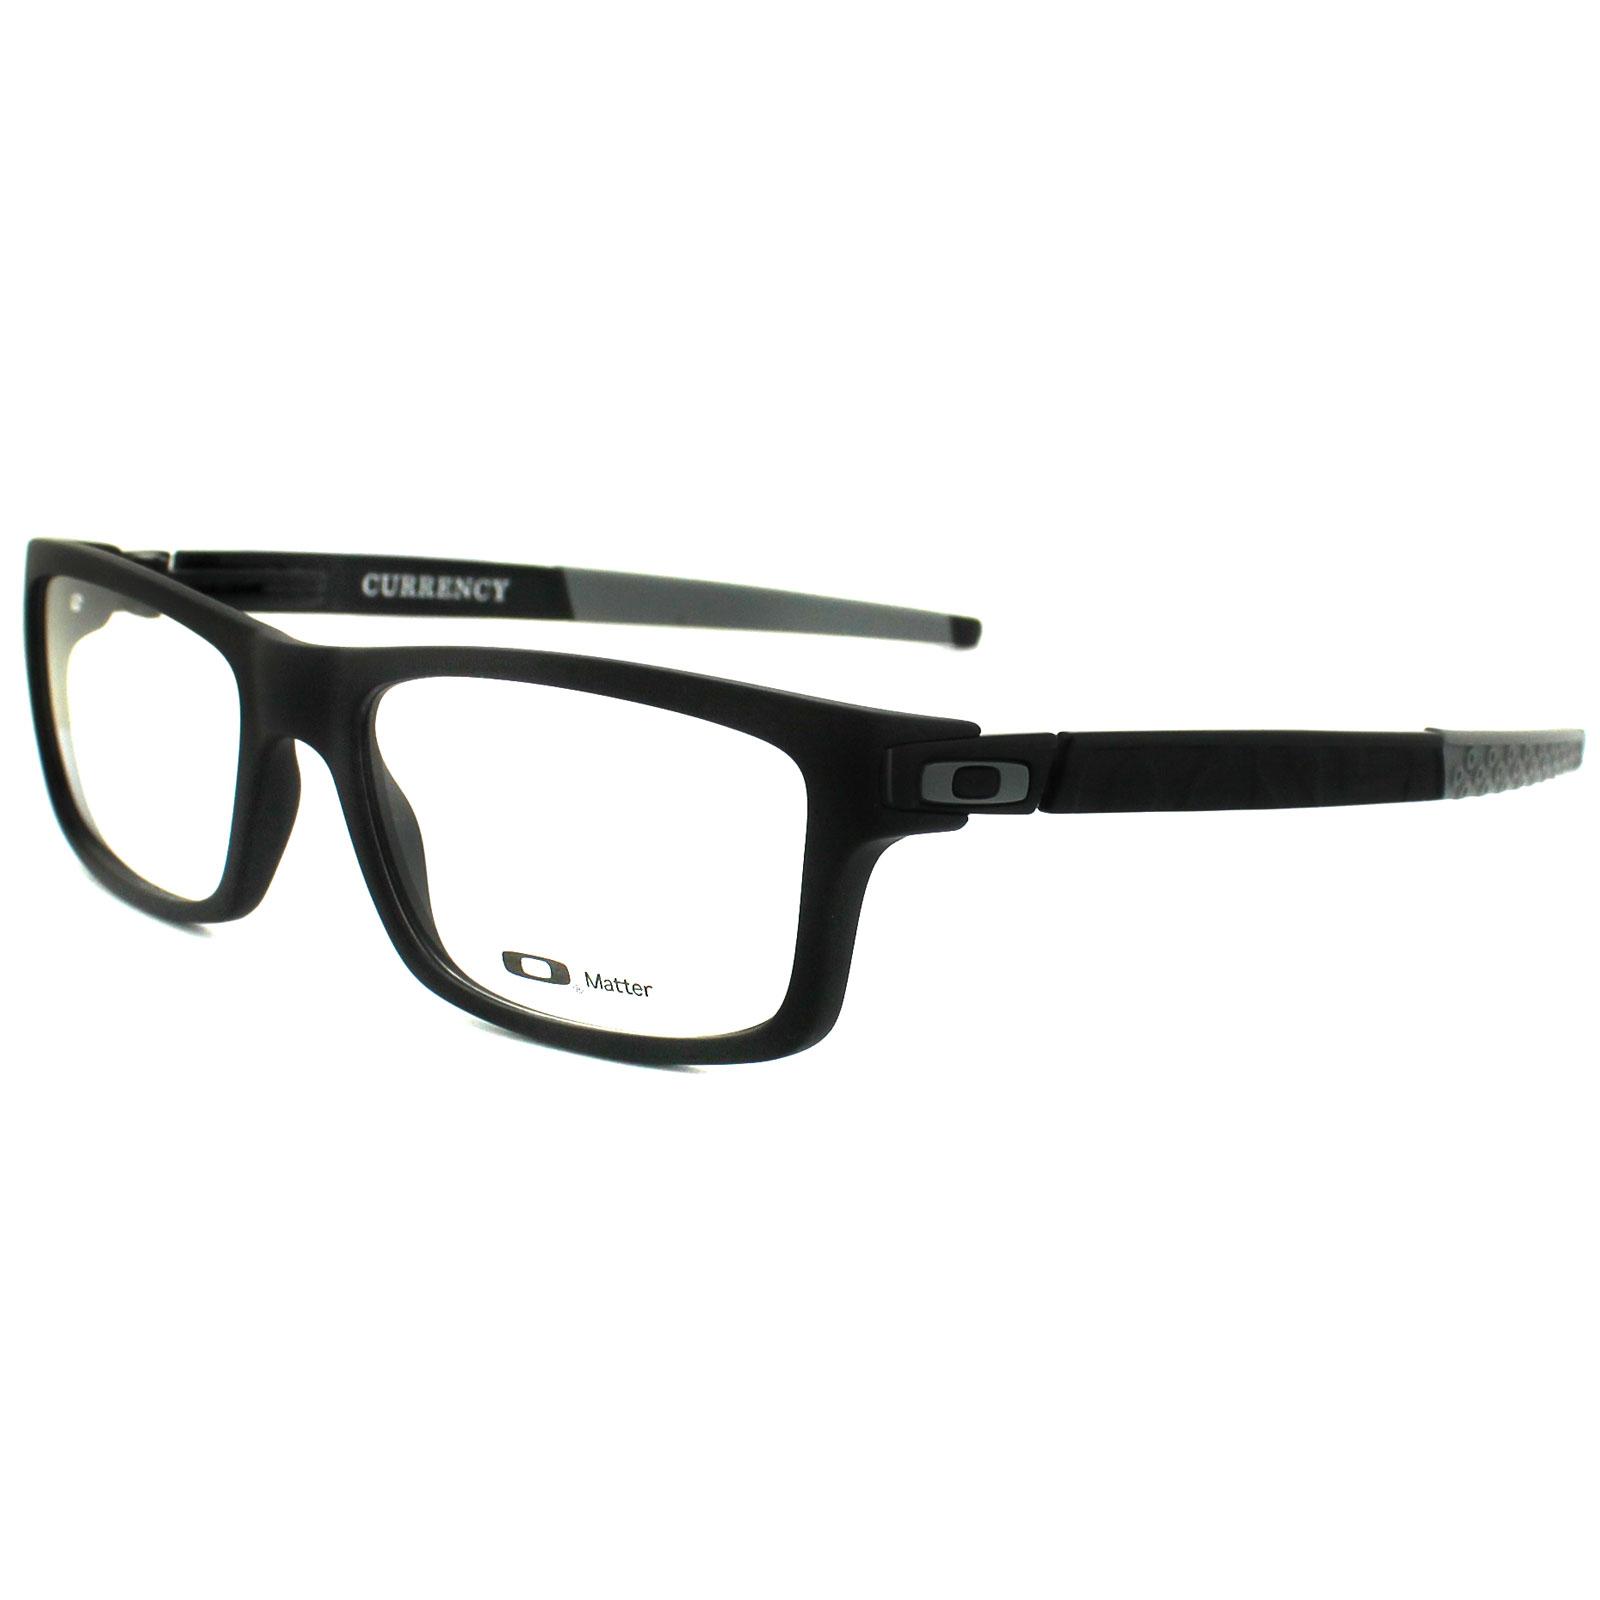 bd01dd60b2 Link Glasses Frames At Costco